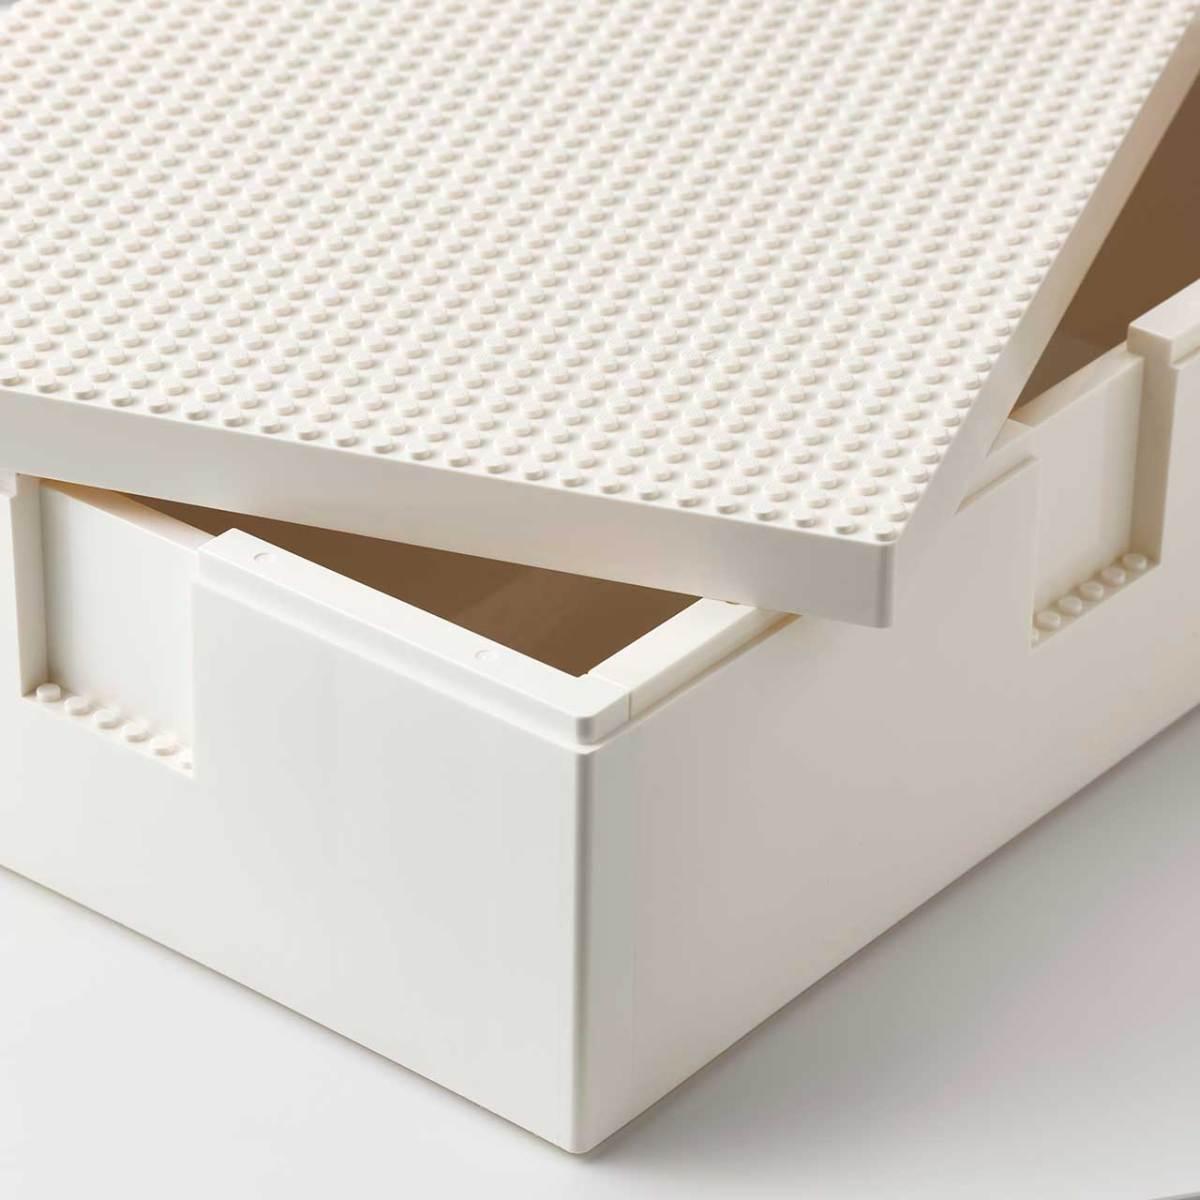 BYGGLEK-IKEA-Lego-storage-boxes-4